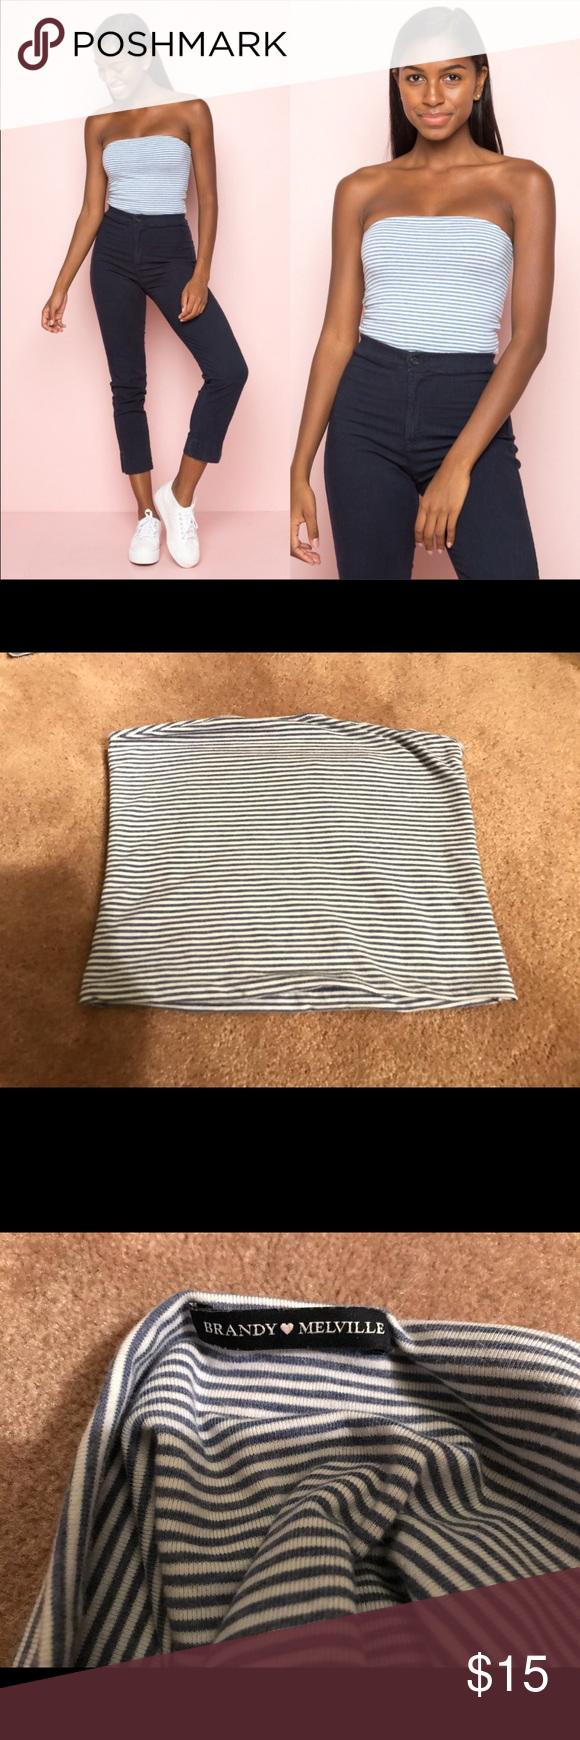 01848b0662 Spotted while shopping on Poshmark  Brandy melville blue stripe jenny tube  top!  poshmark  fashion  shopping  style  Brandy Melville  Tops